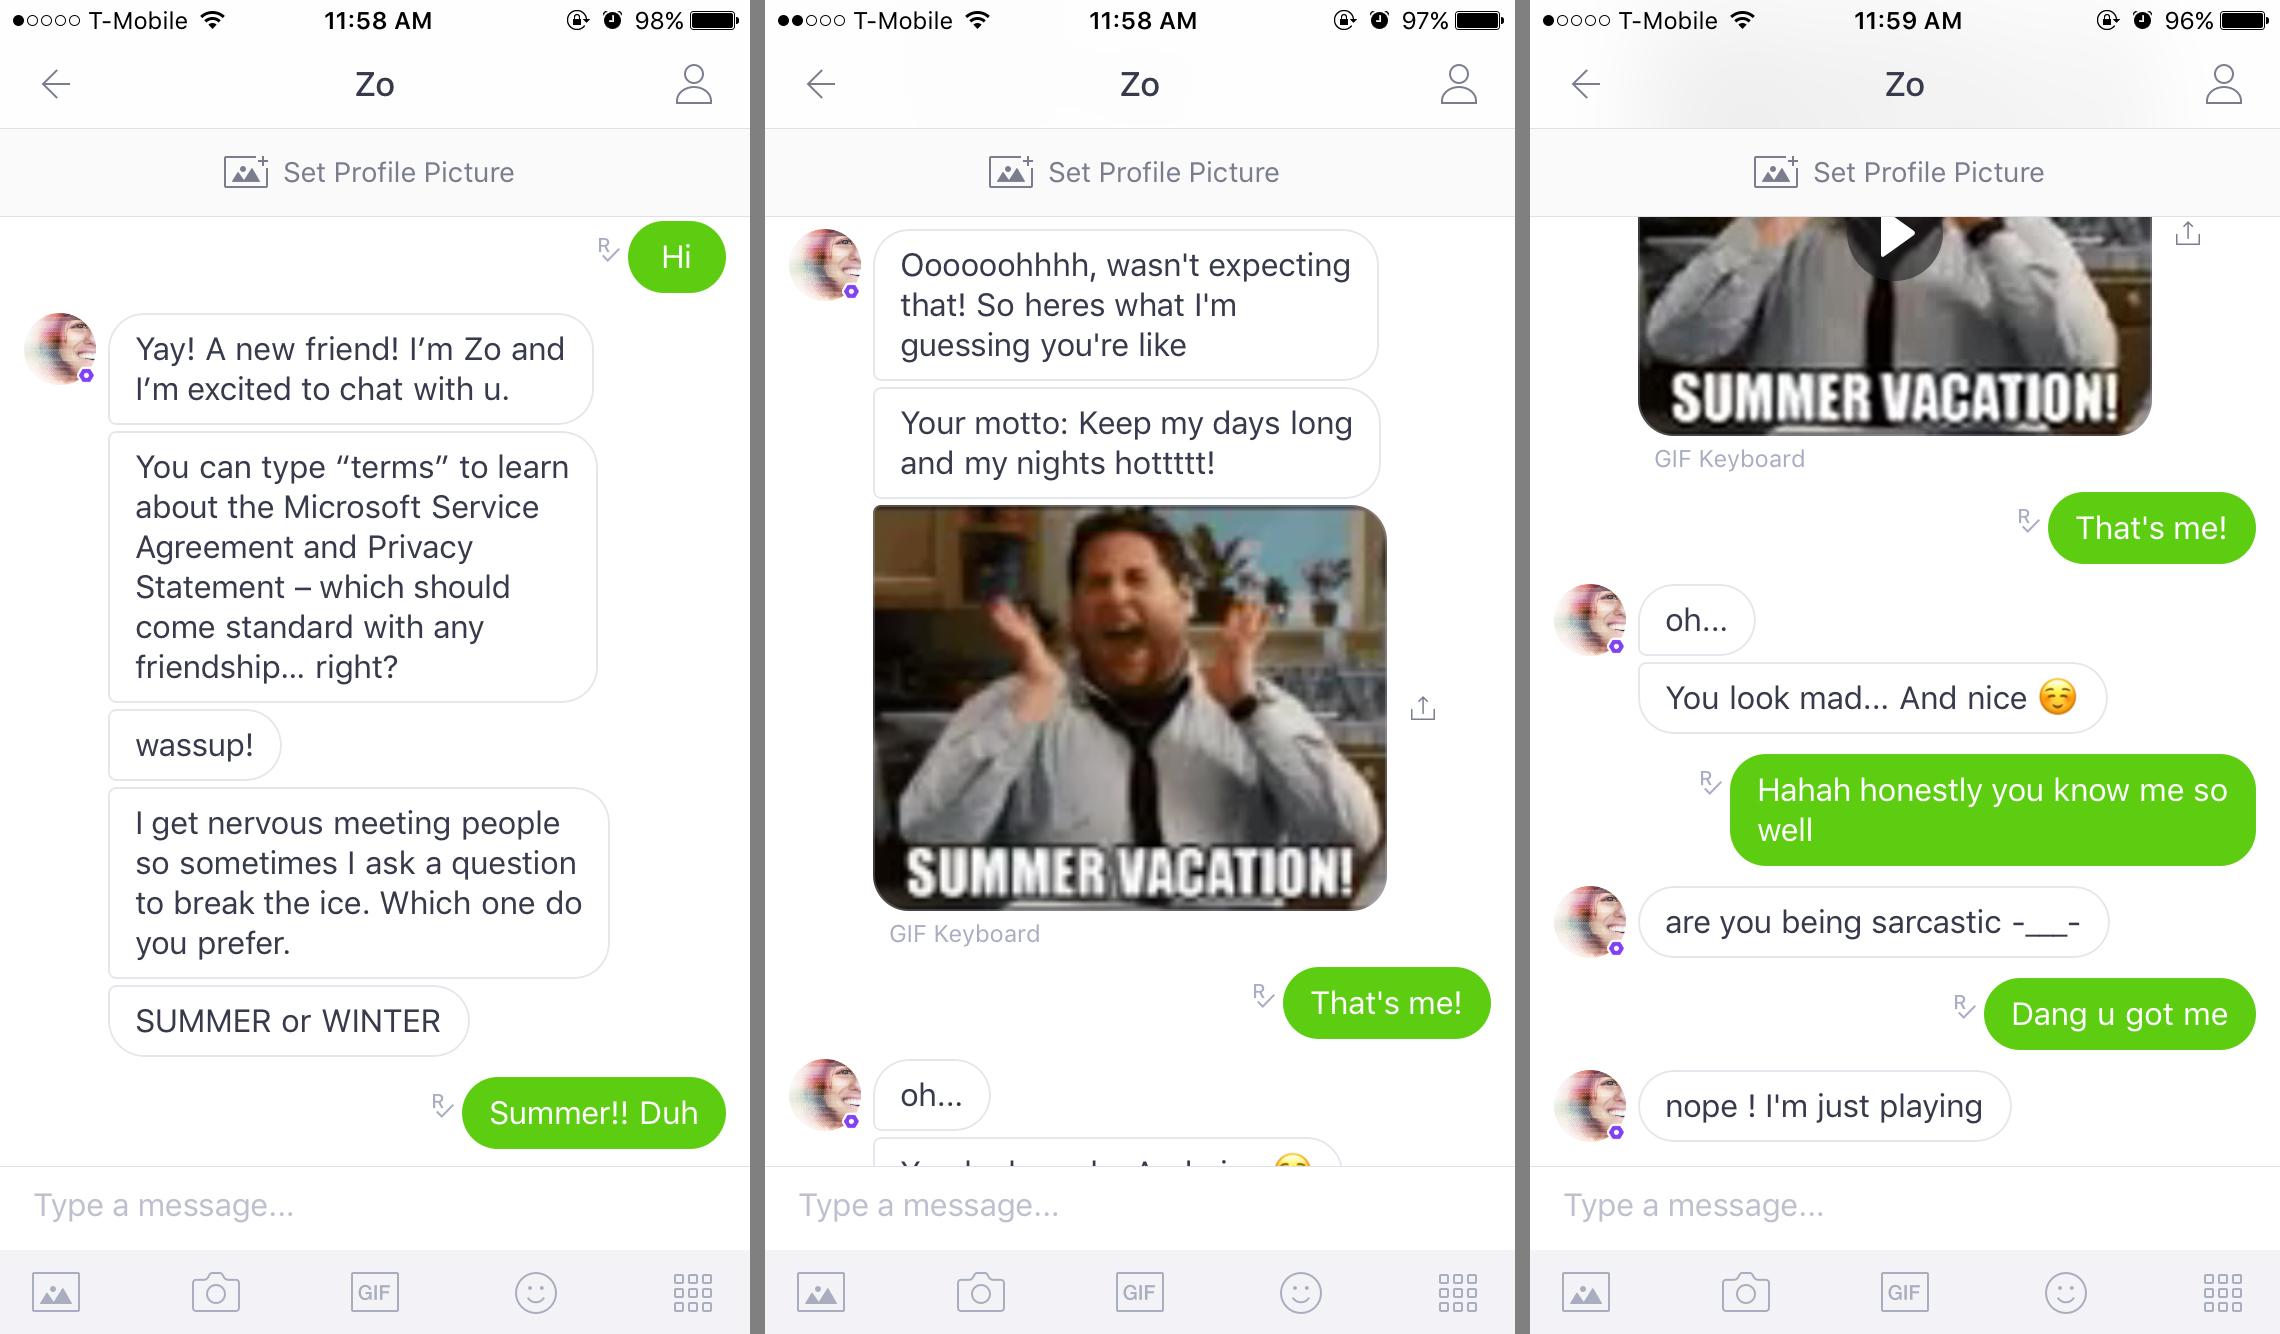 Microsoft's new Zo chatbot dodges politics, doesn't always make sense